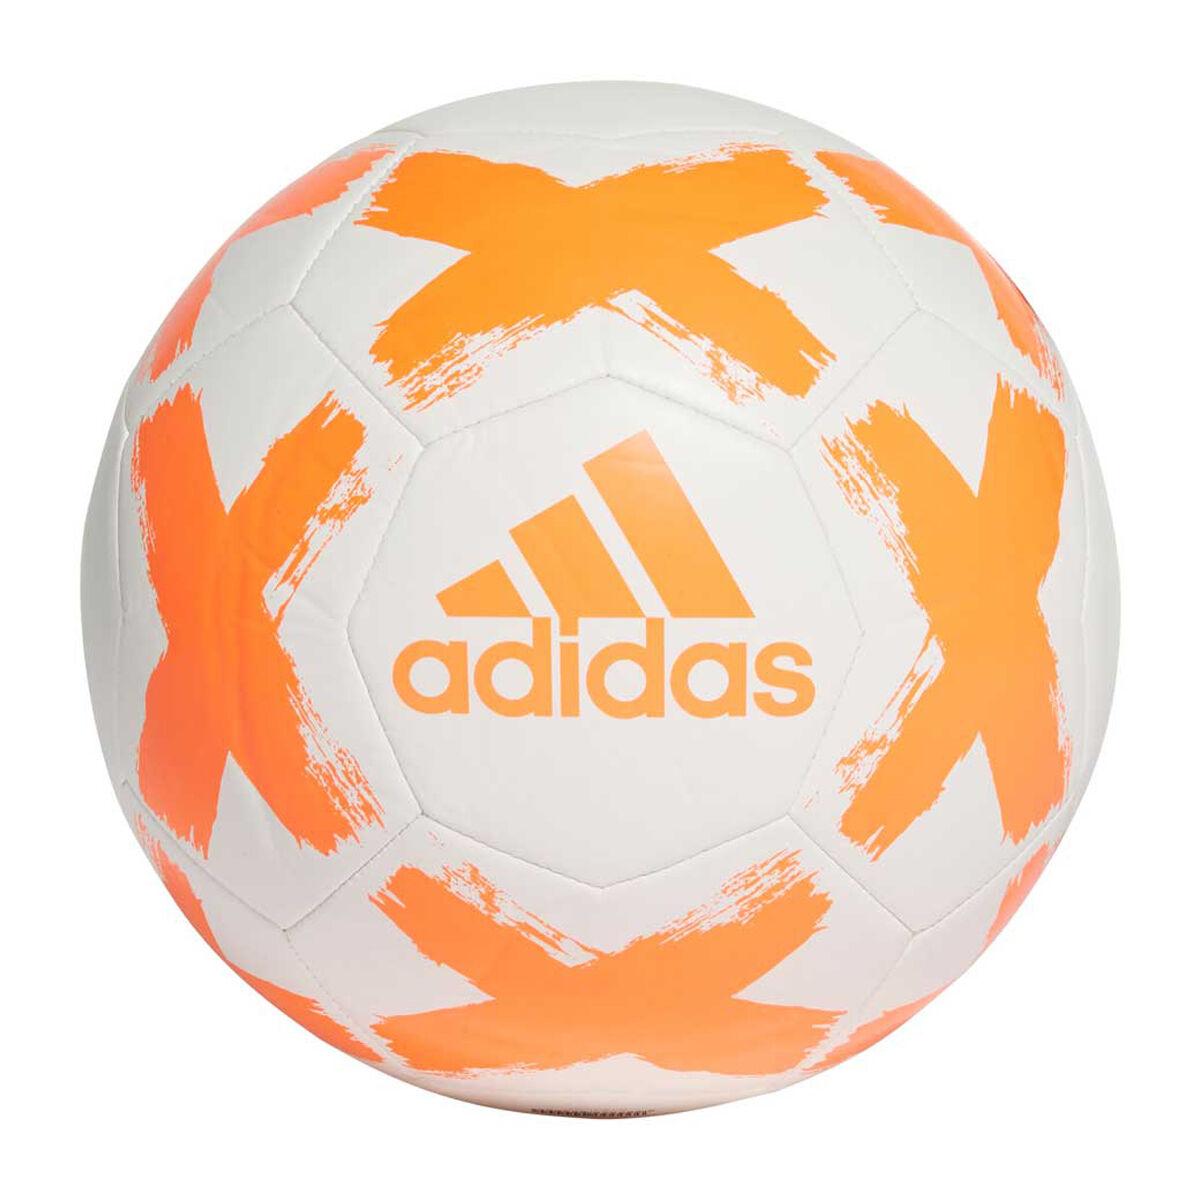 adidas Starlancer V Soccer Ball | Rebel